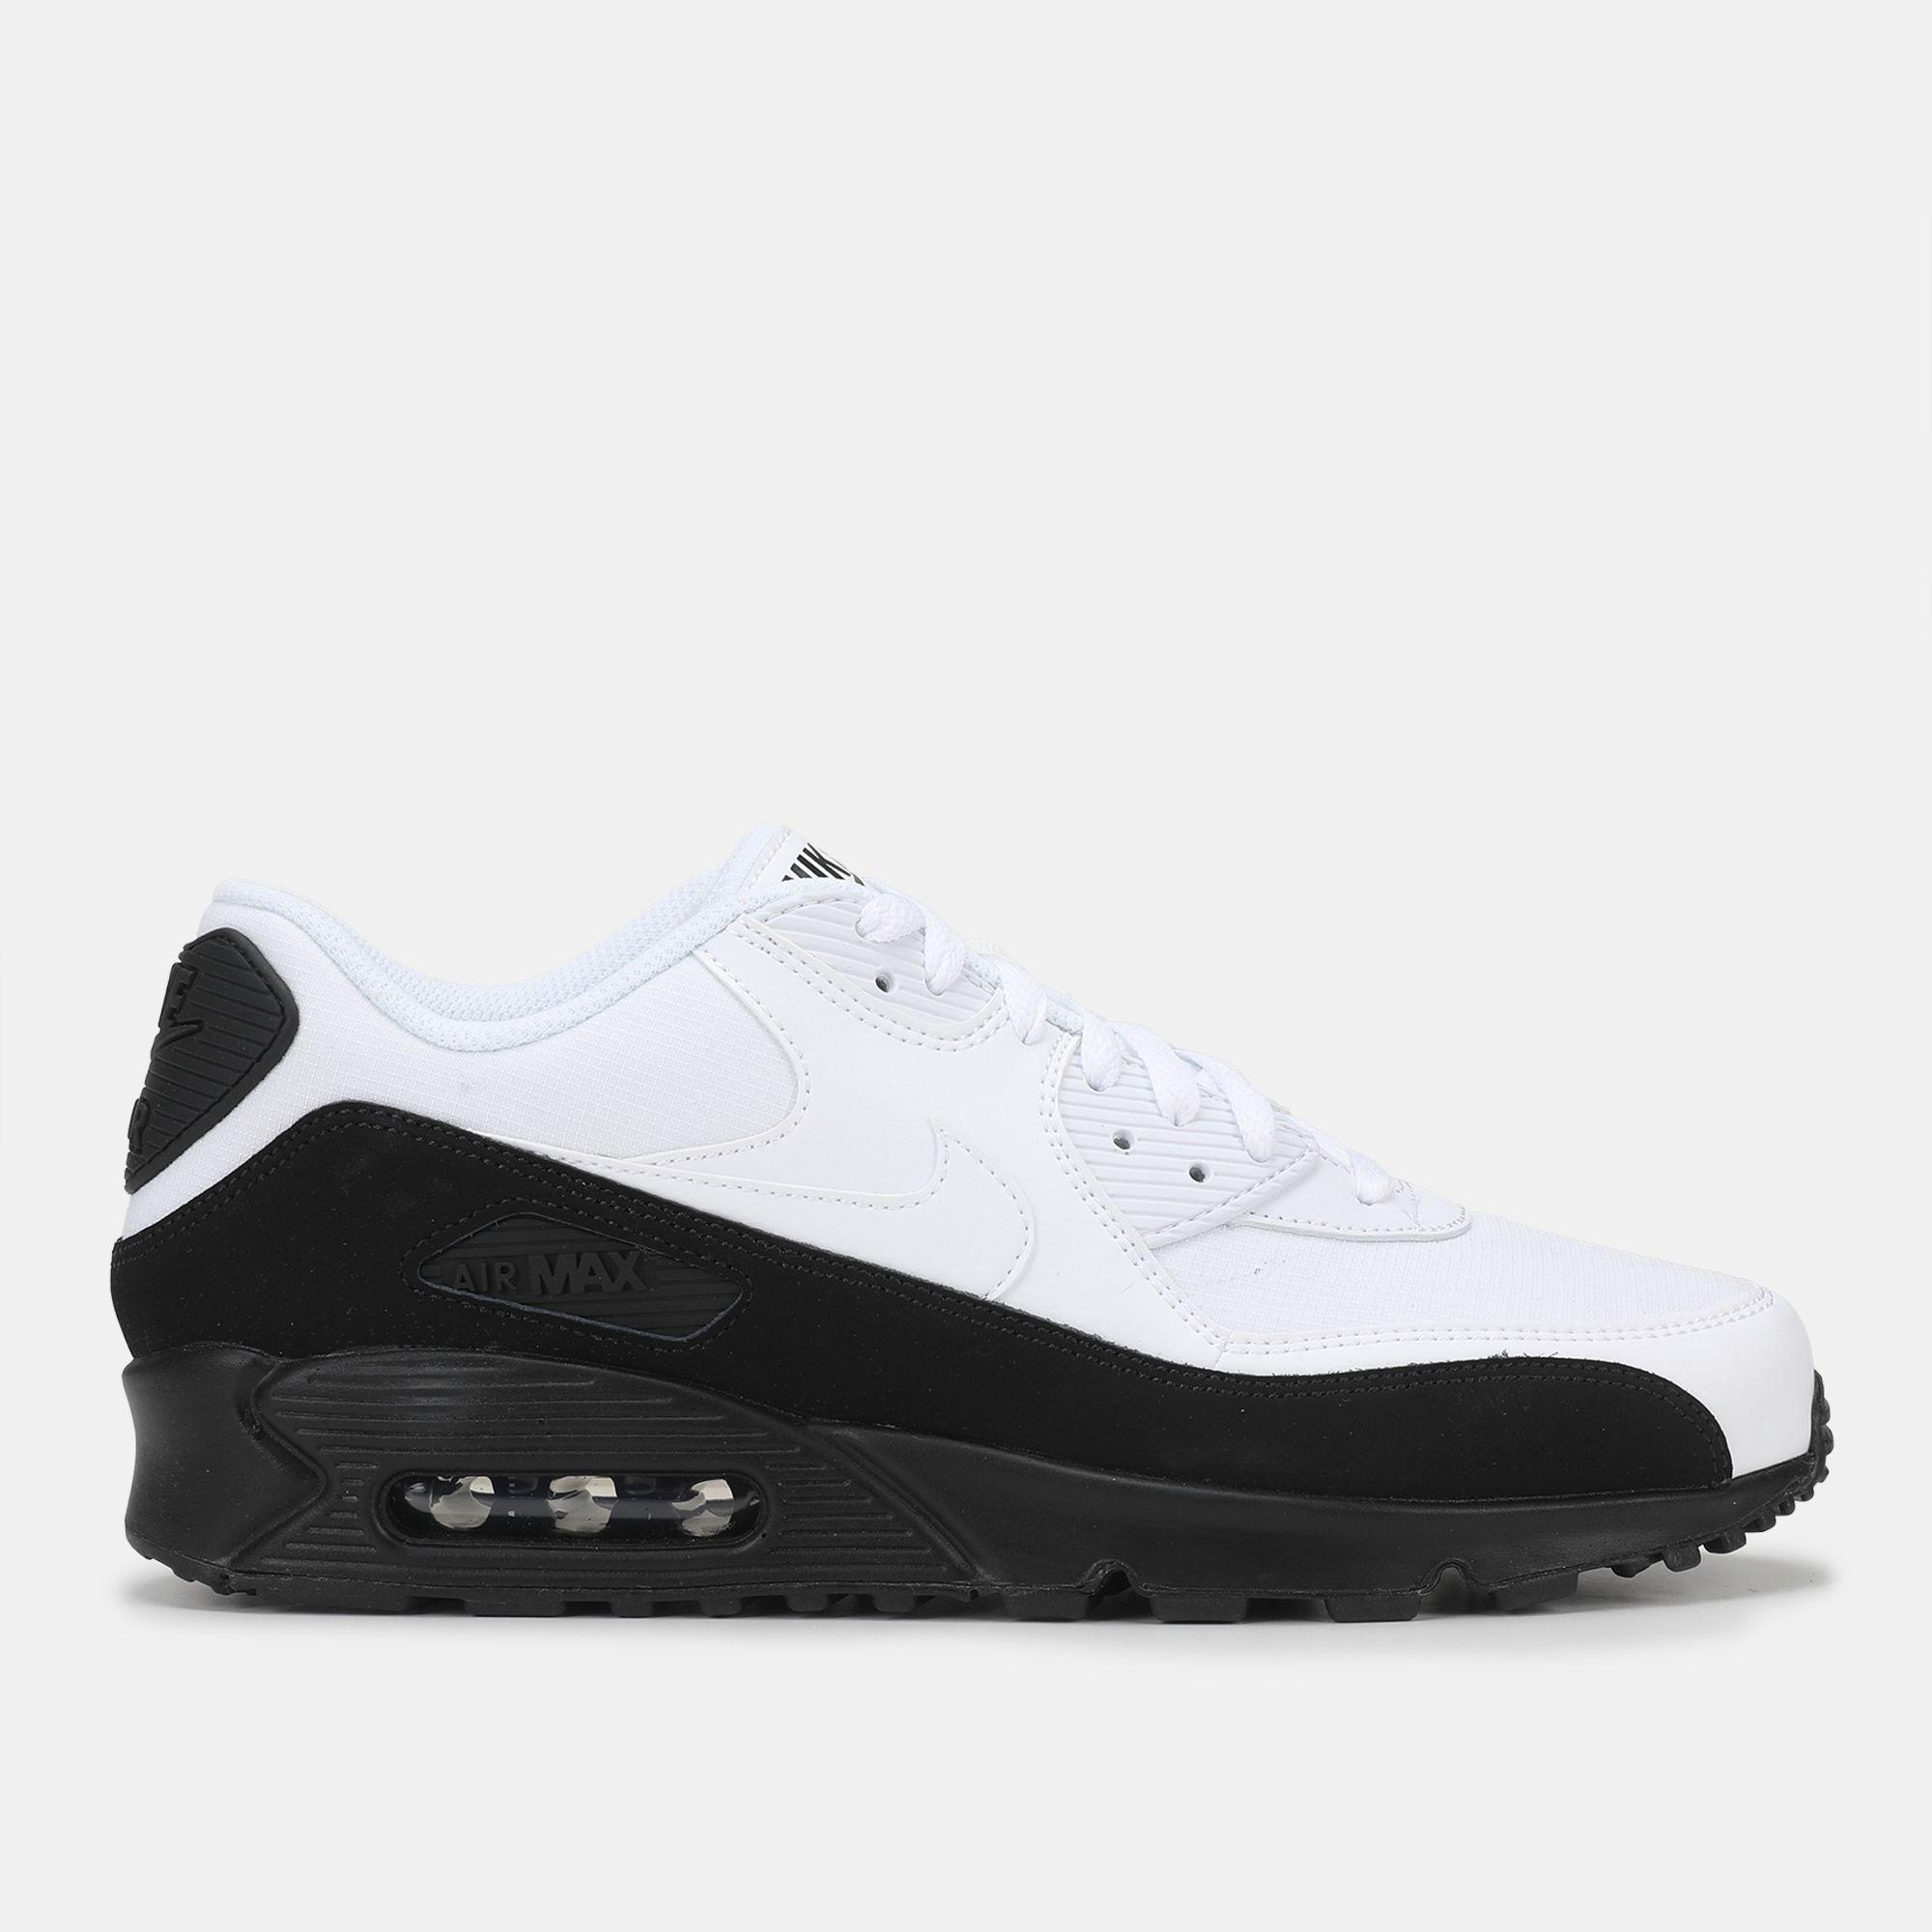 best cheap 68d60 f4a13 Nike Air Max 90 Essential Shoe   Sneakers   Shoes   Sports Fashion   Sports   NIKEAJ1285-6   SSS